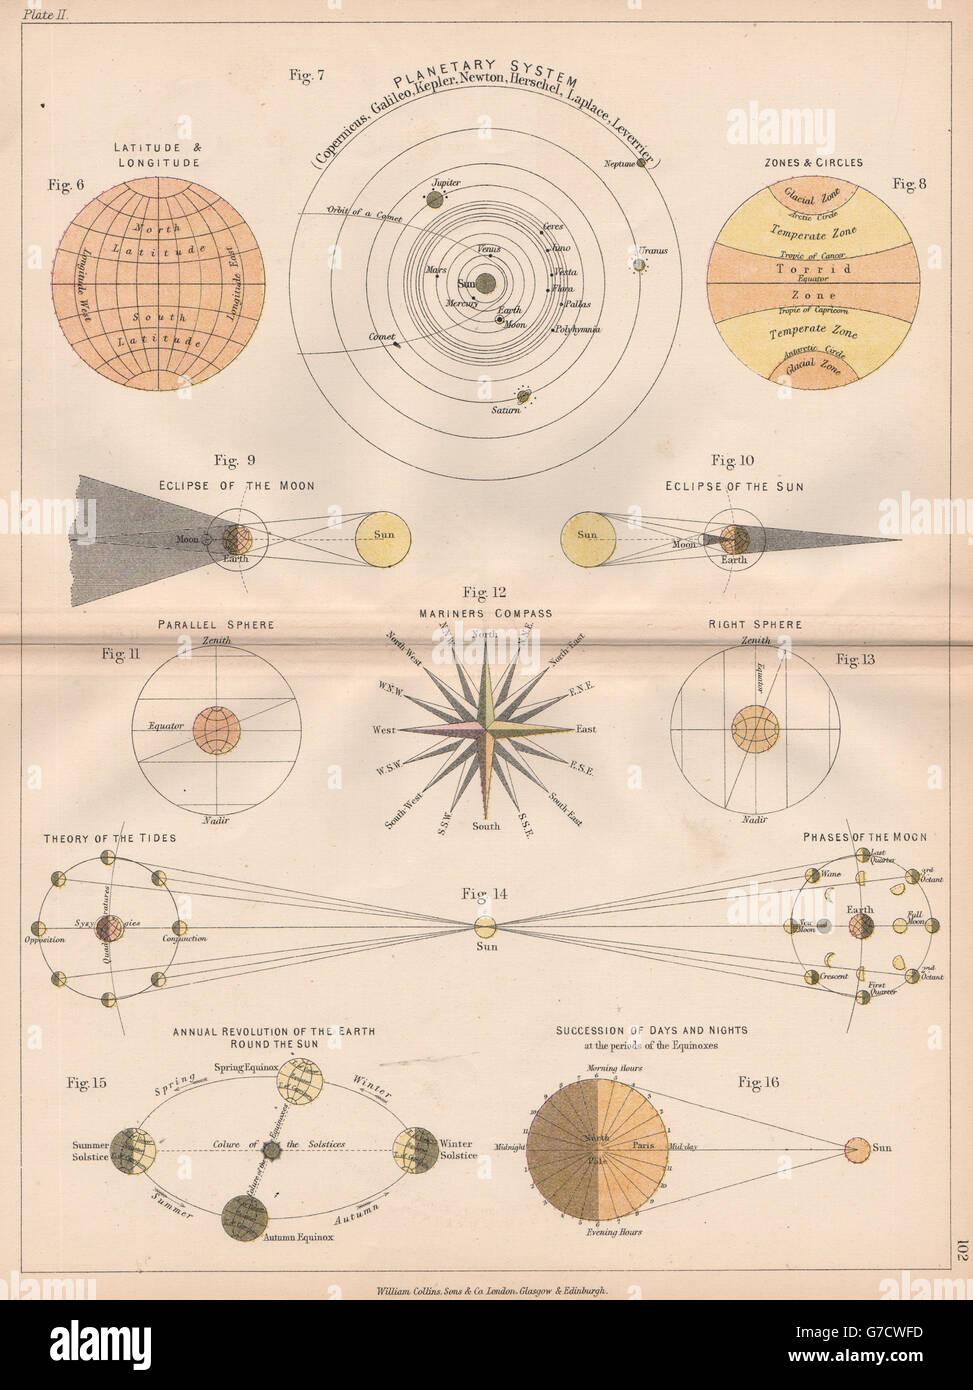 STAR CHART Solar system Eclipses Tides Moon phases BARTHOLOMEW